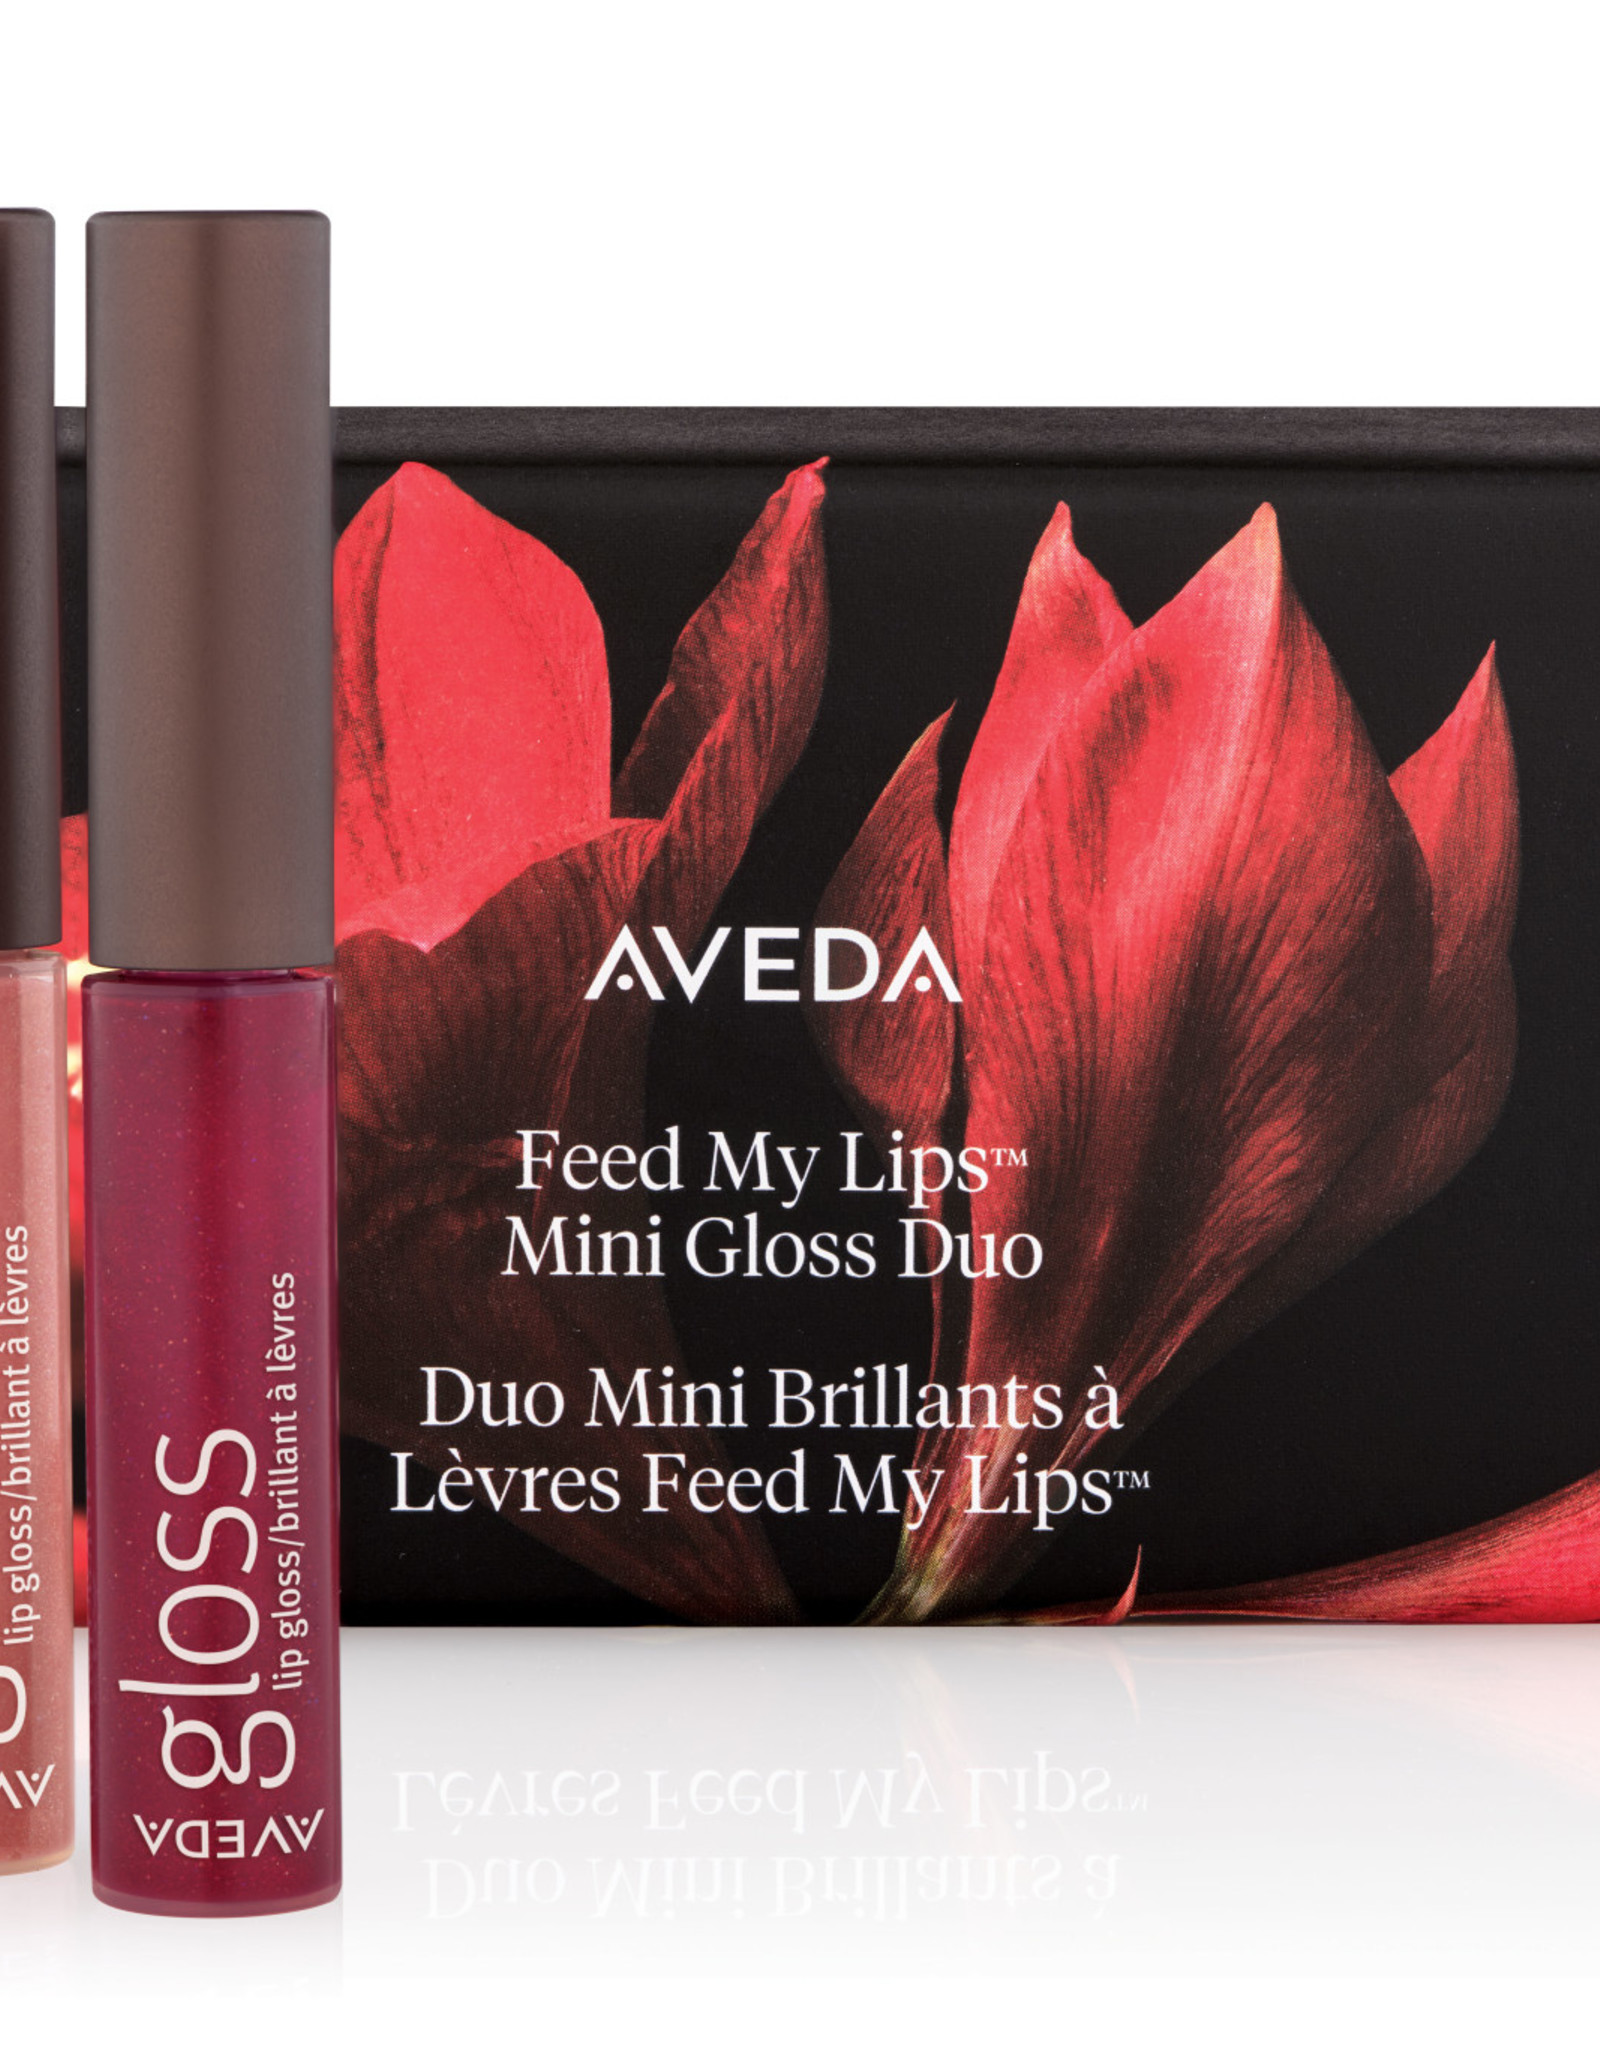 AVEDA Feed My Lips™ Mini Gloss Duo